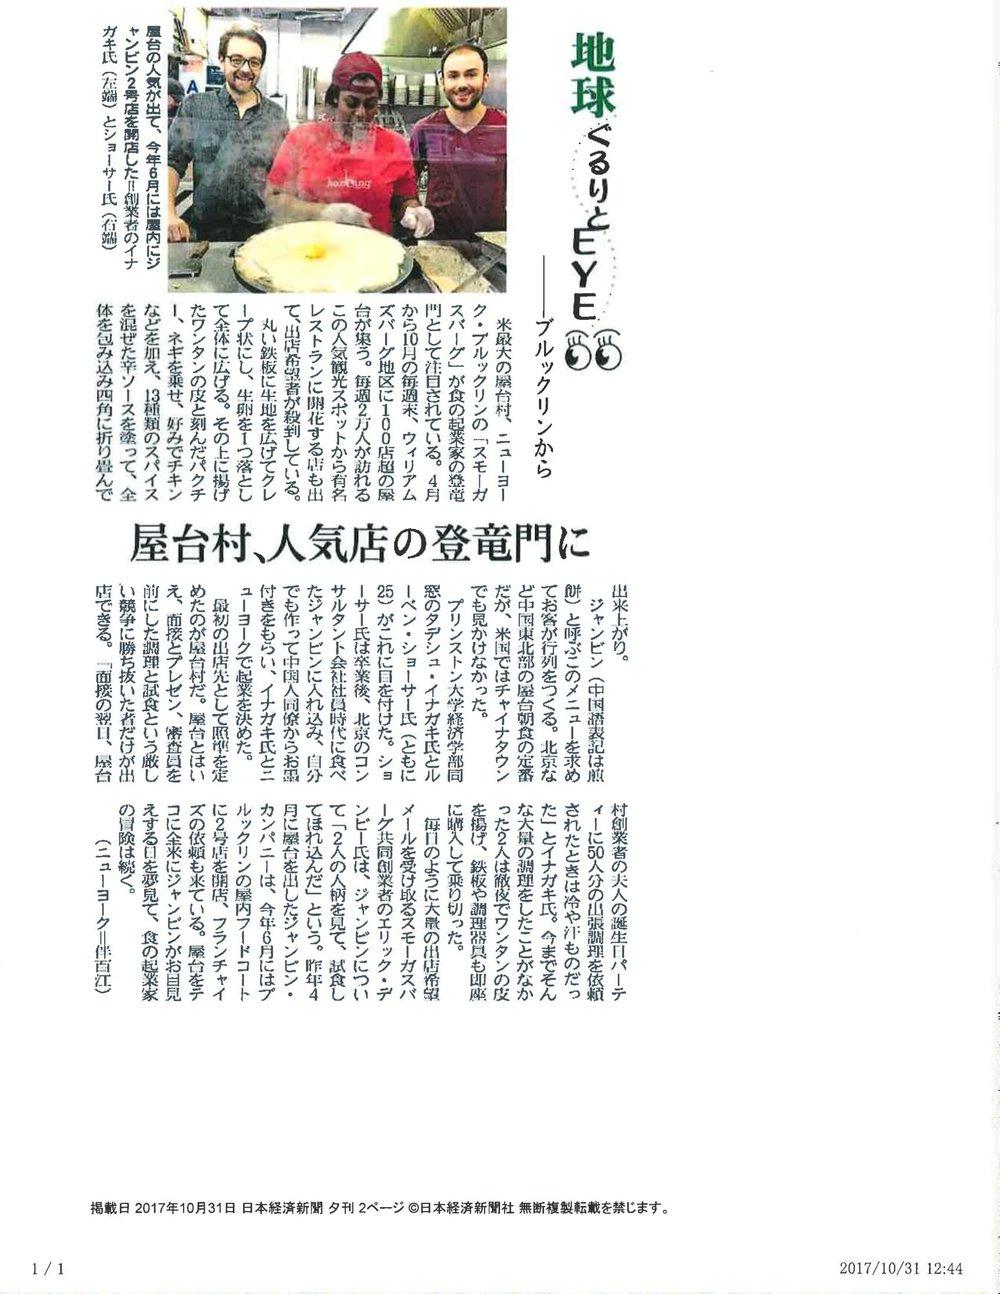 Nikkei Evening edition 2017-10-31-1.jpg